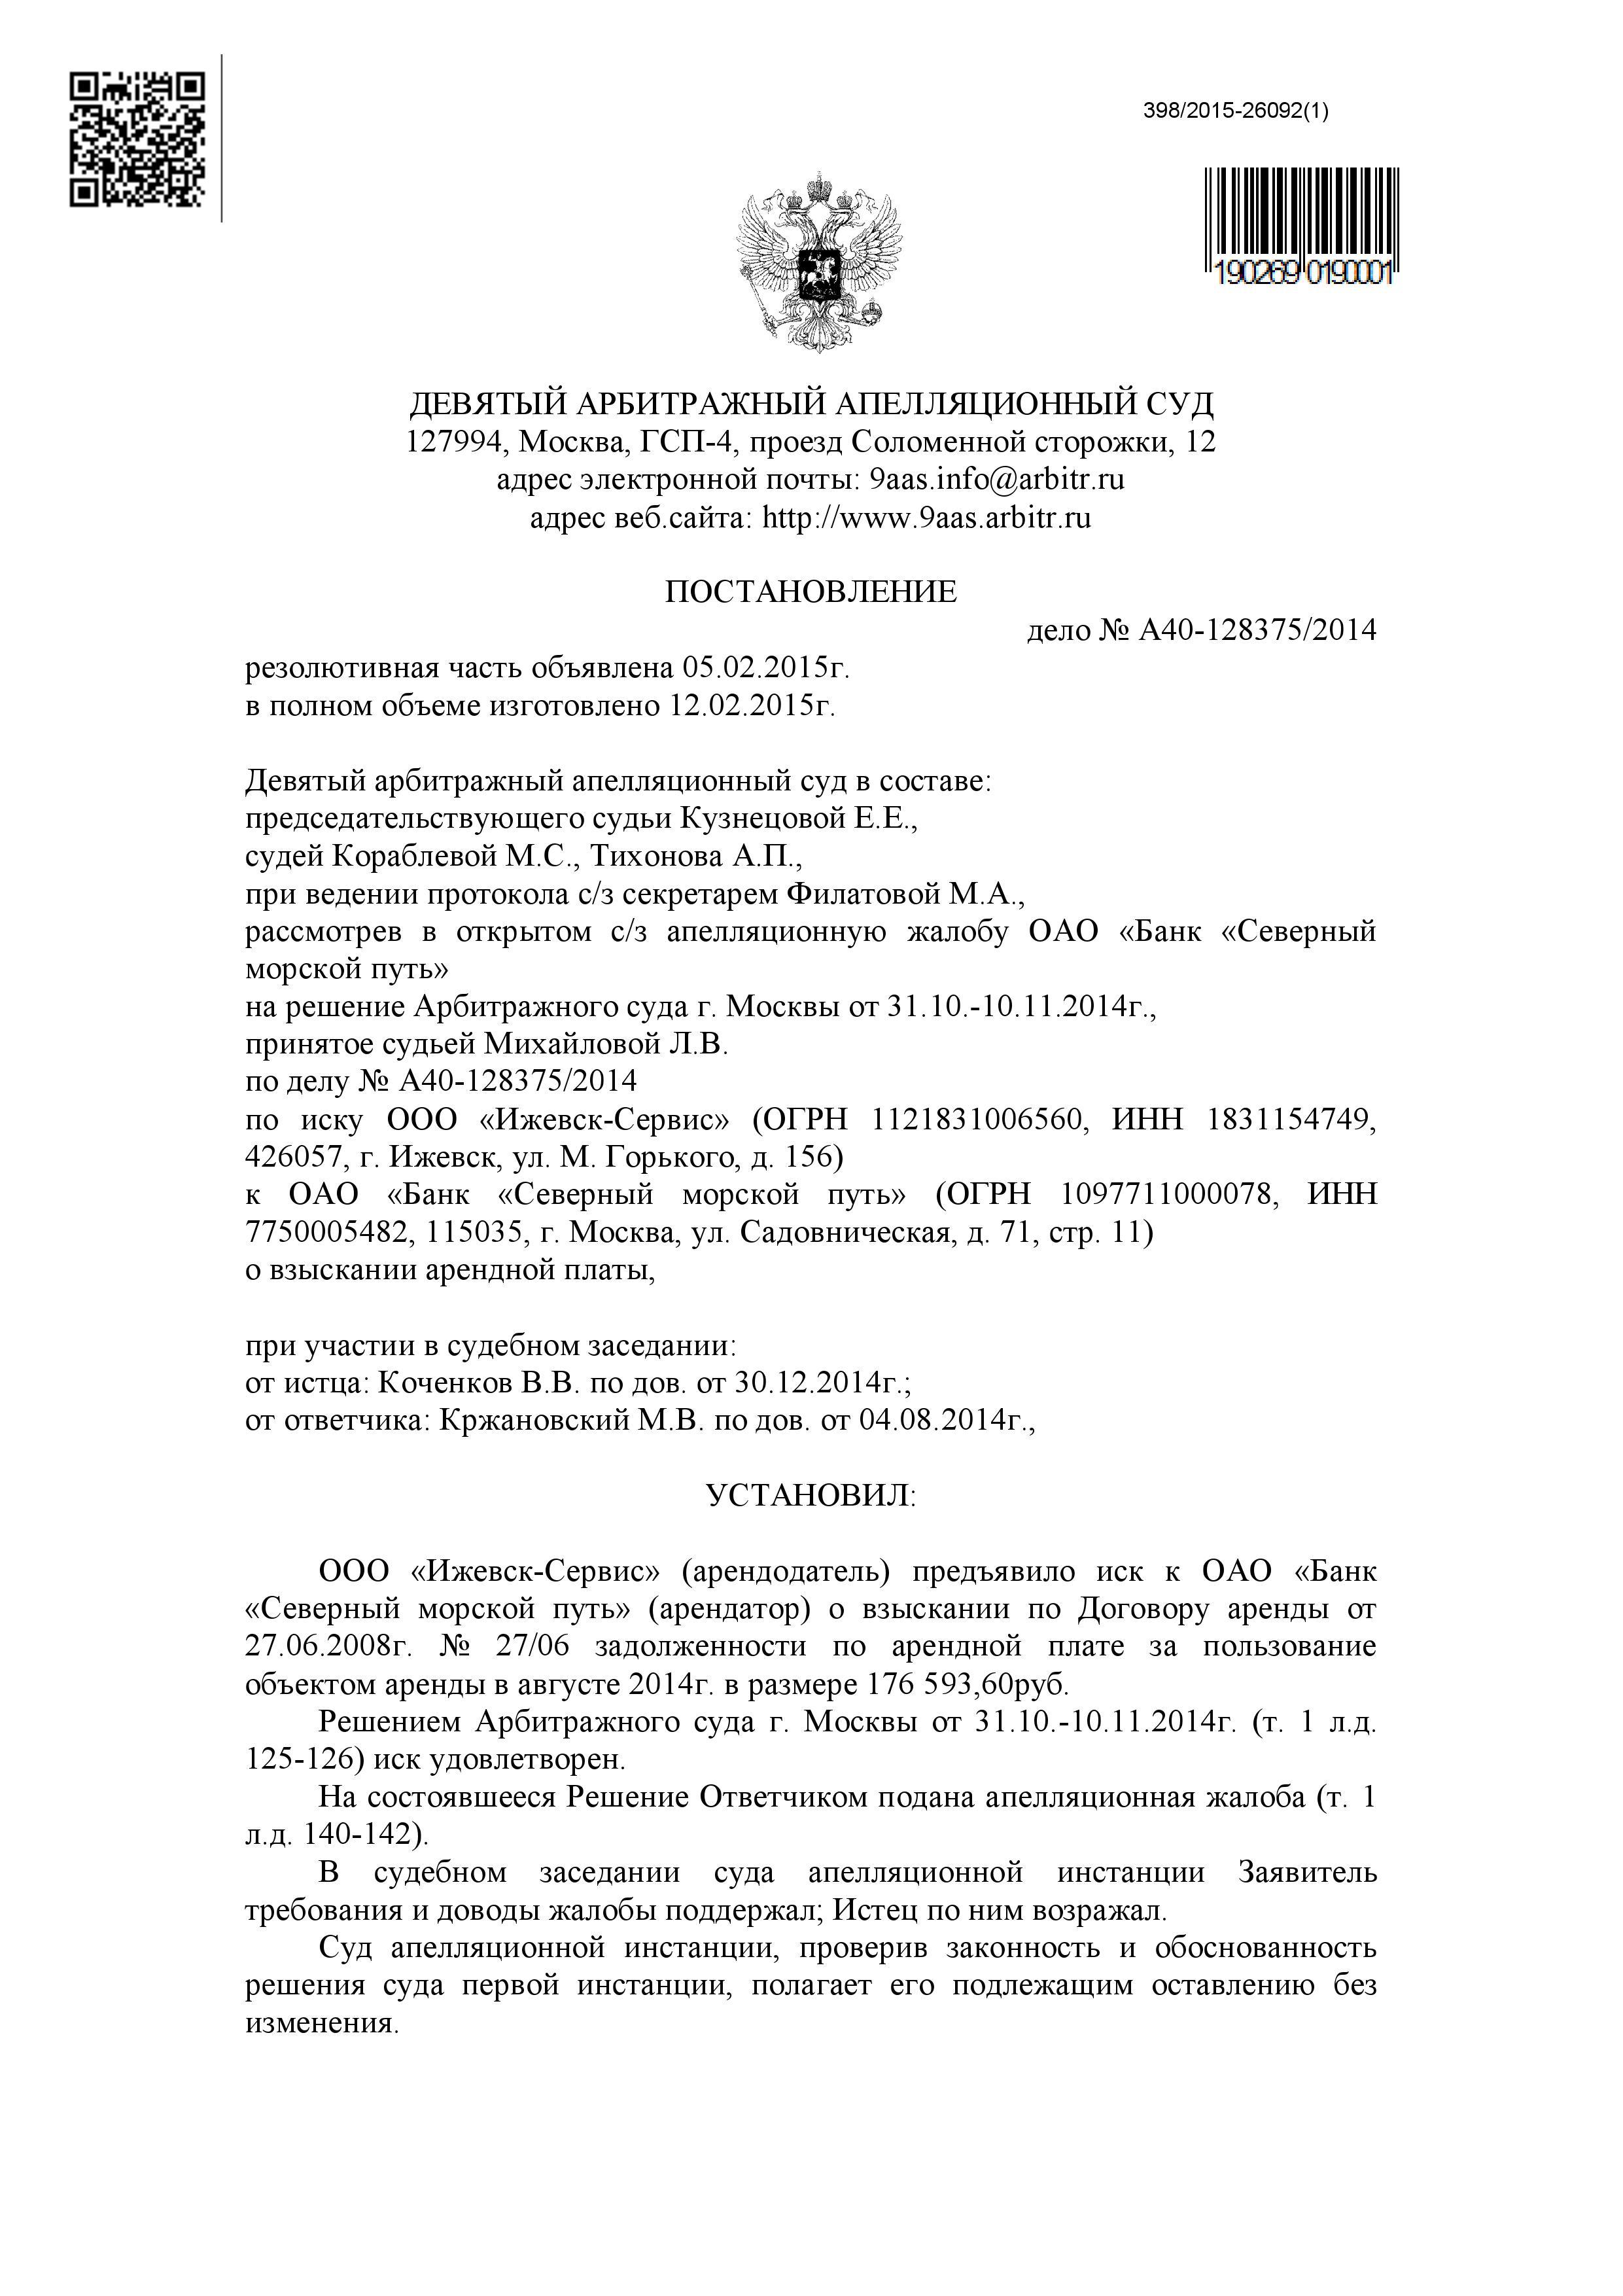 Решение по делу A40-128375-2014